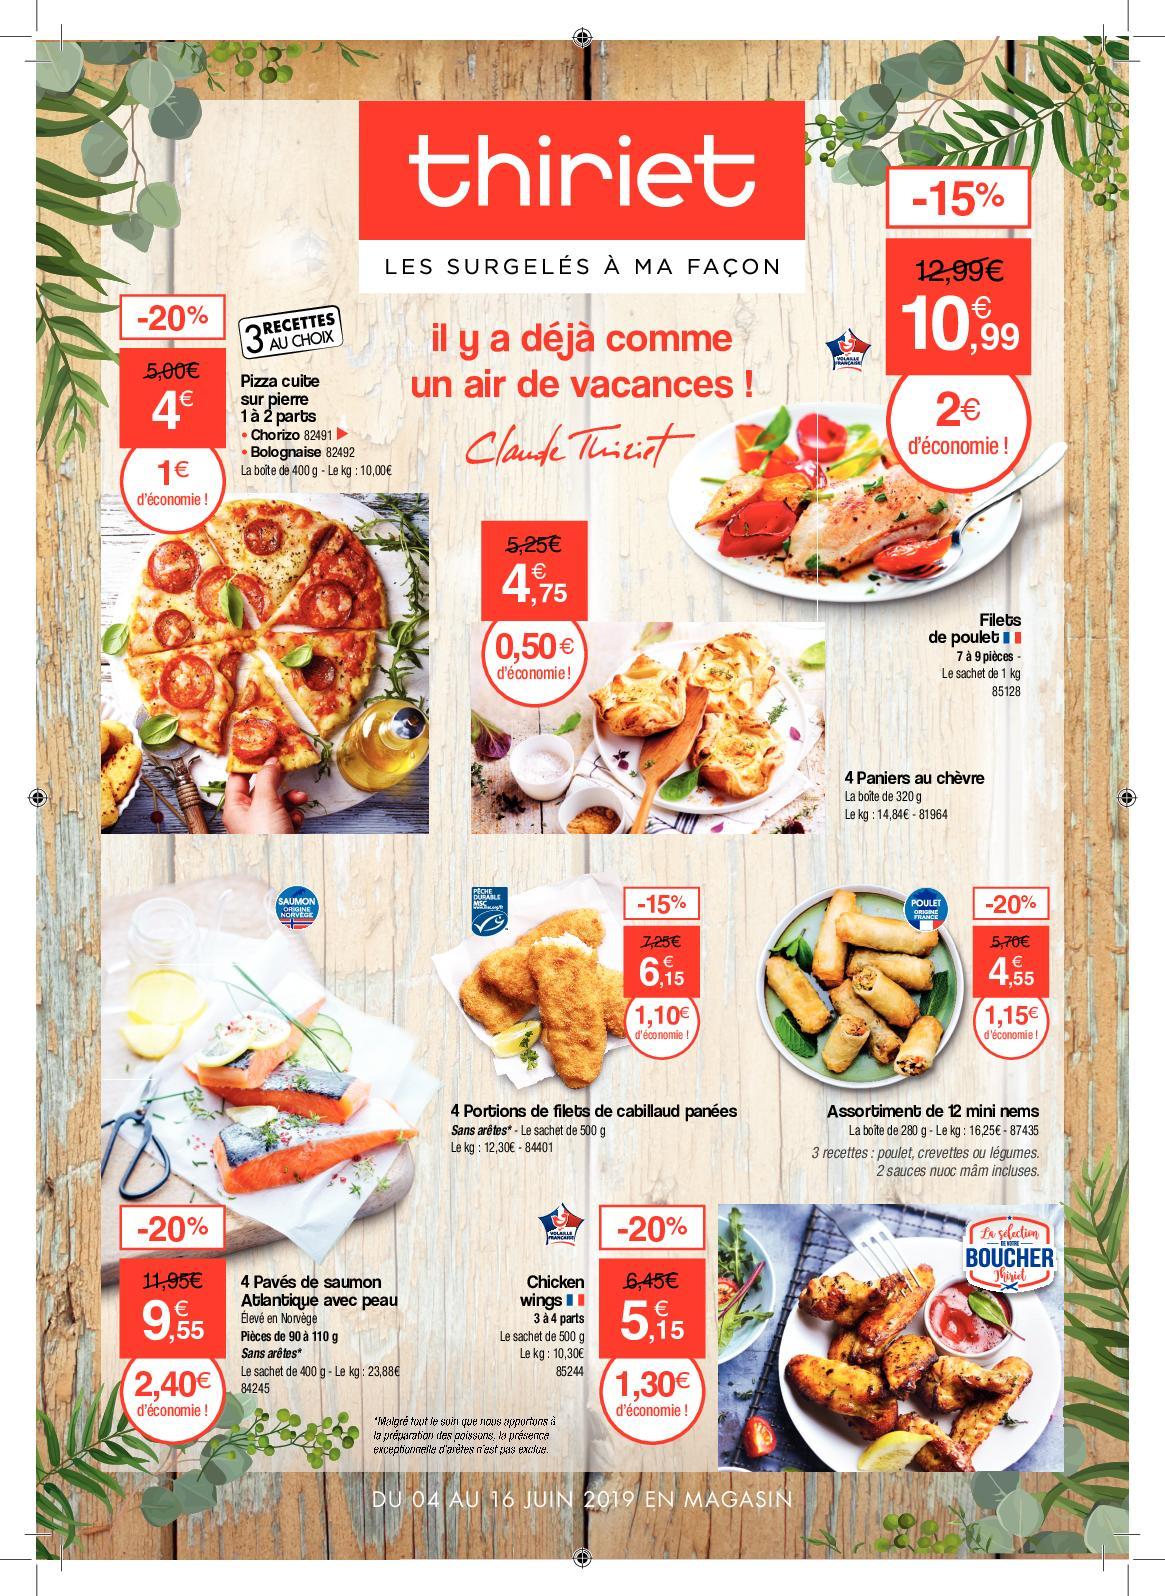 Thiriet Martinique - Catalogue Juin 2019